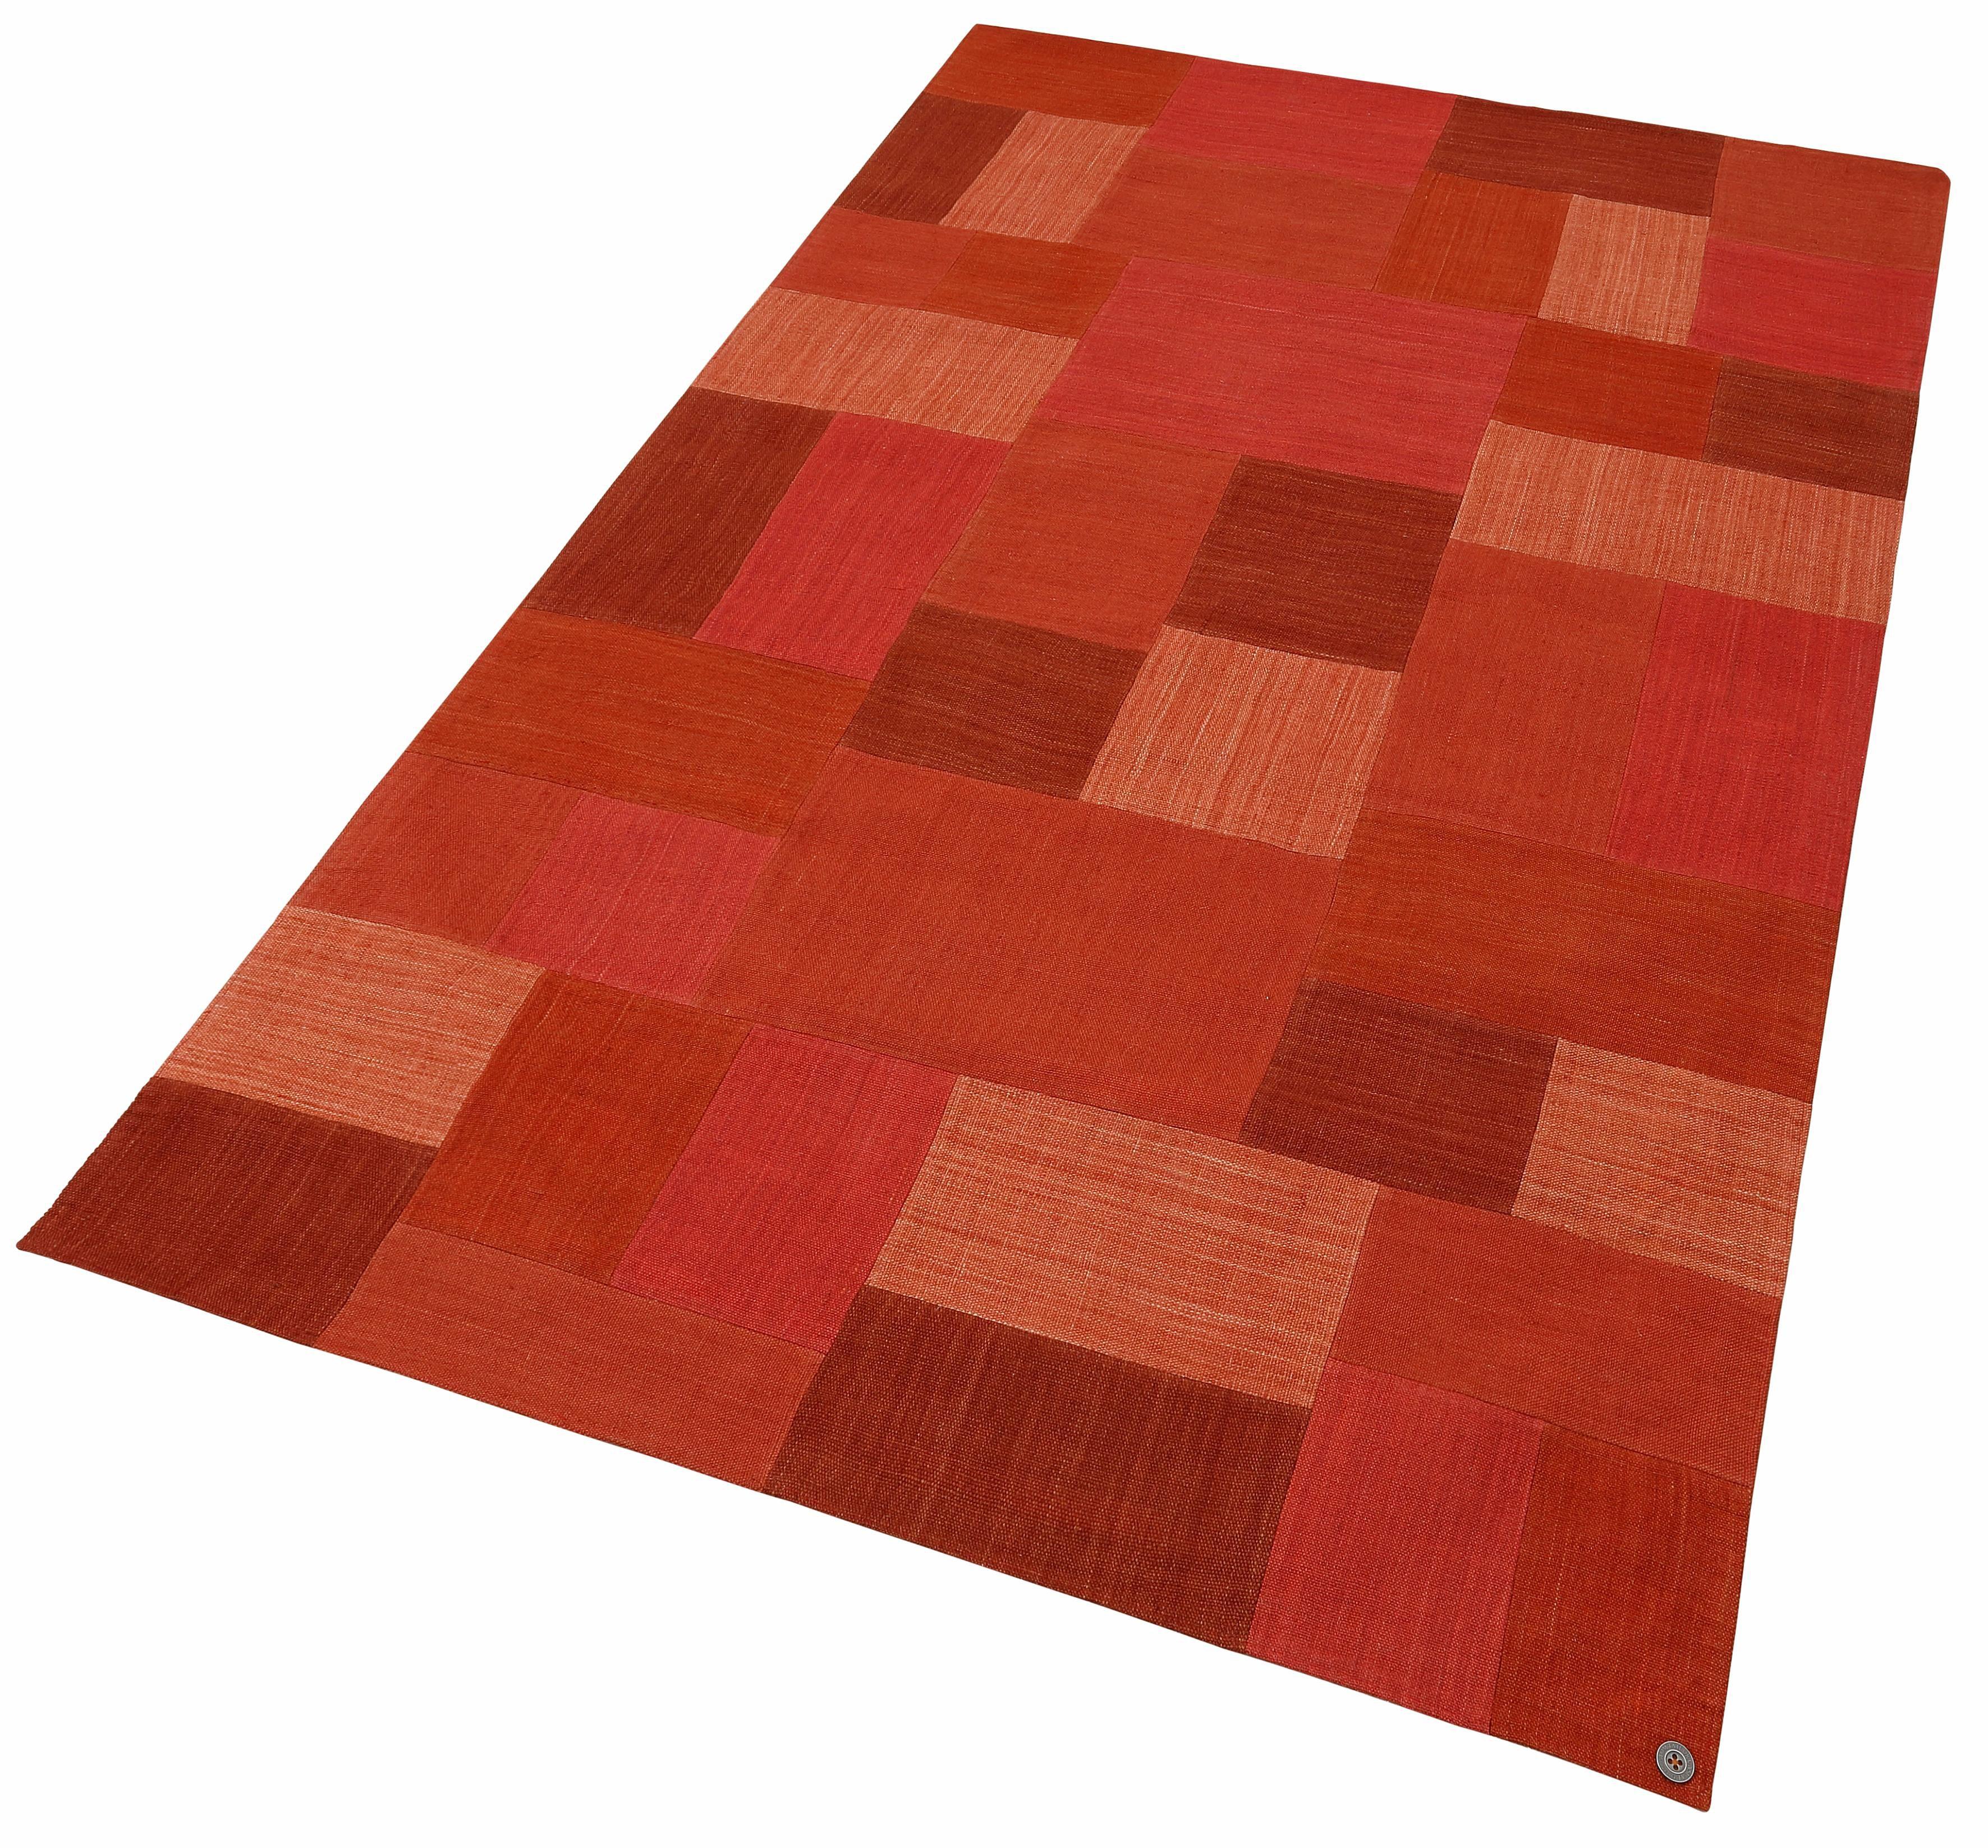 Teppich Patch Denim TOM TAILOR rechteckig Höhe 5 mm handgewebt